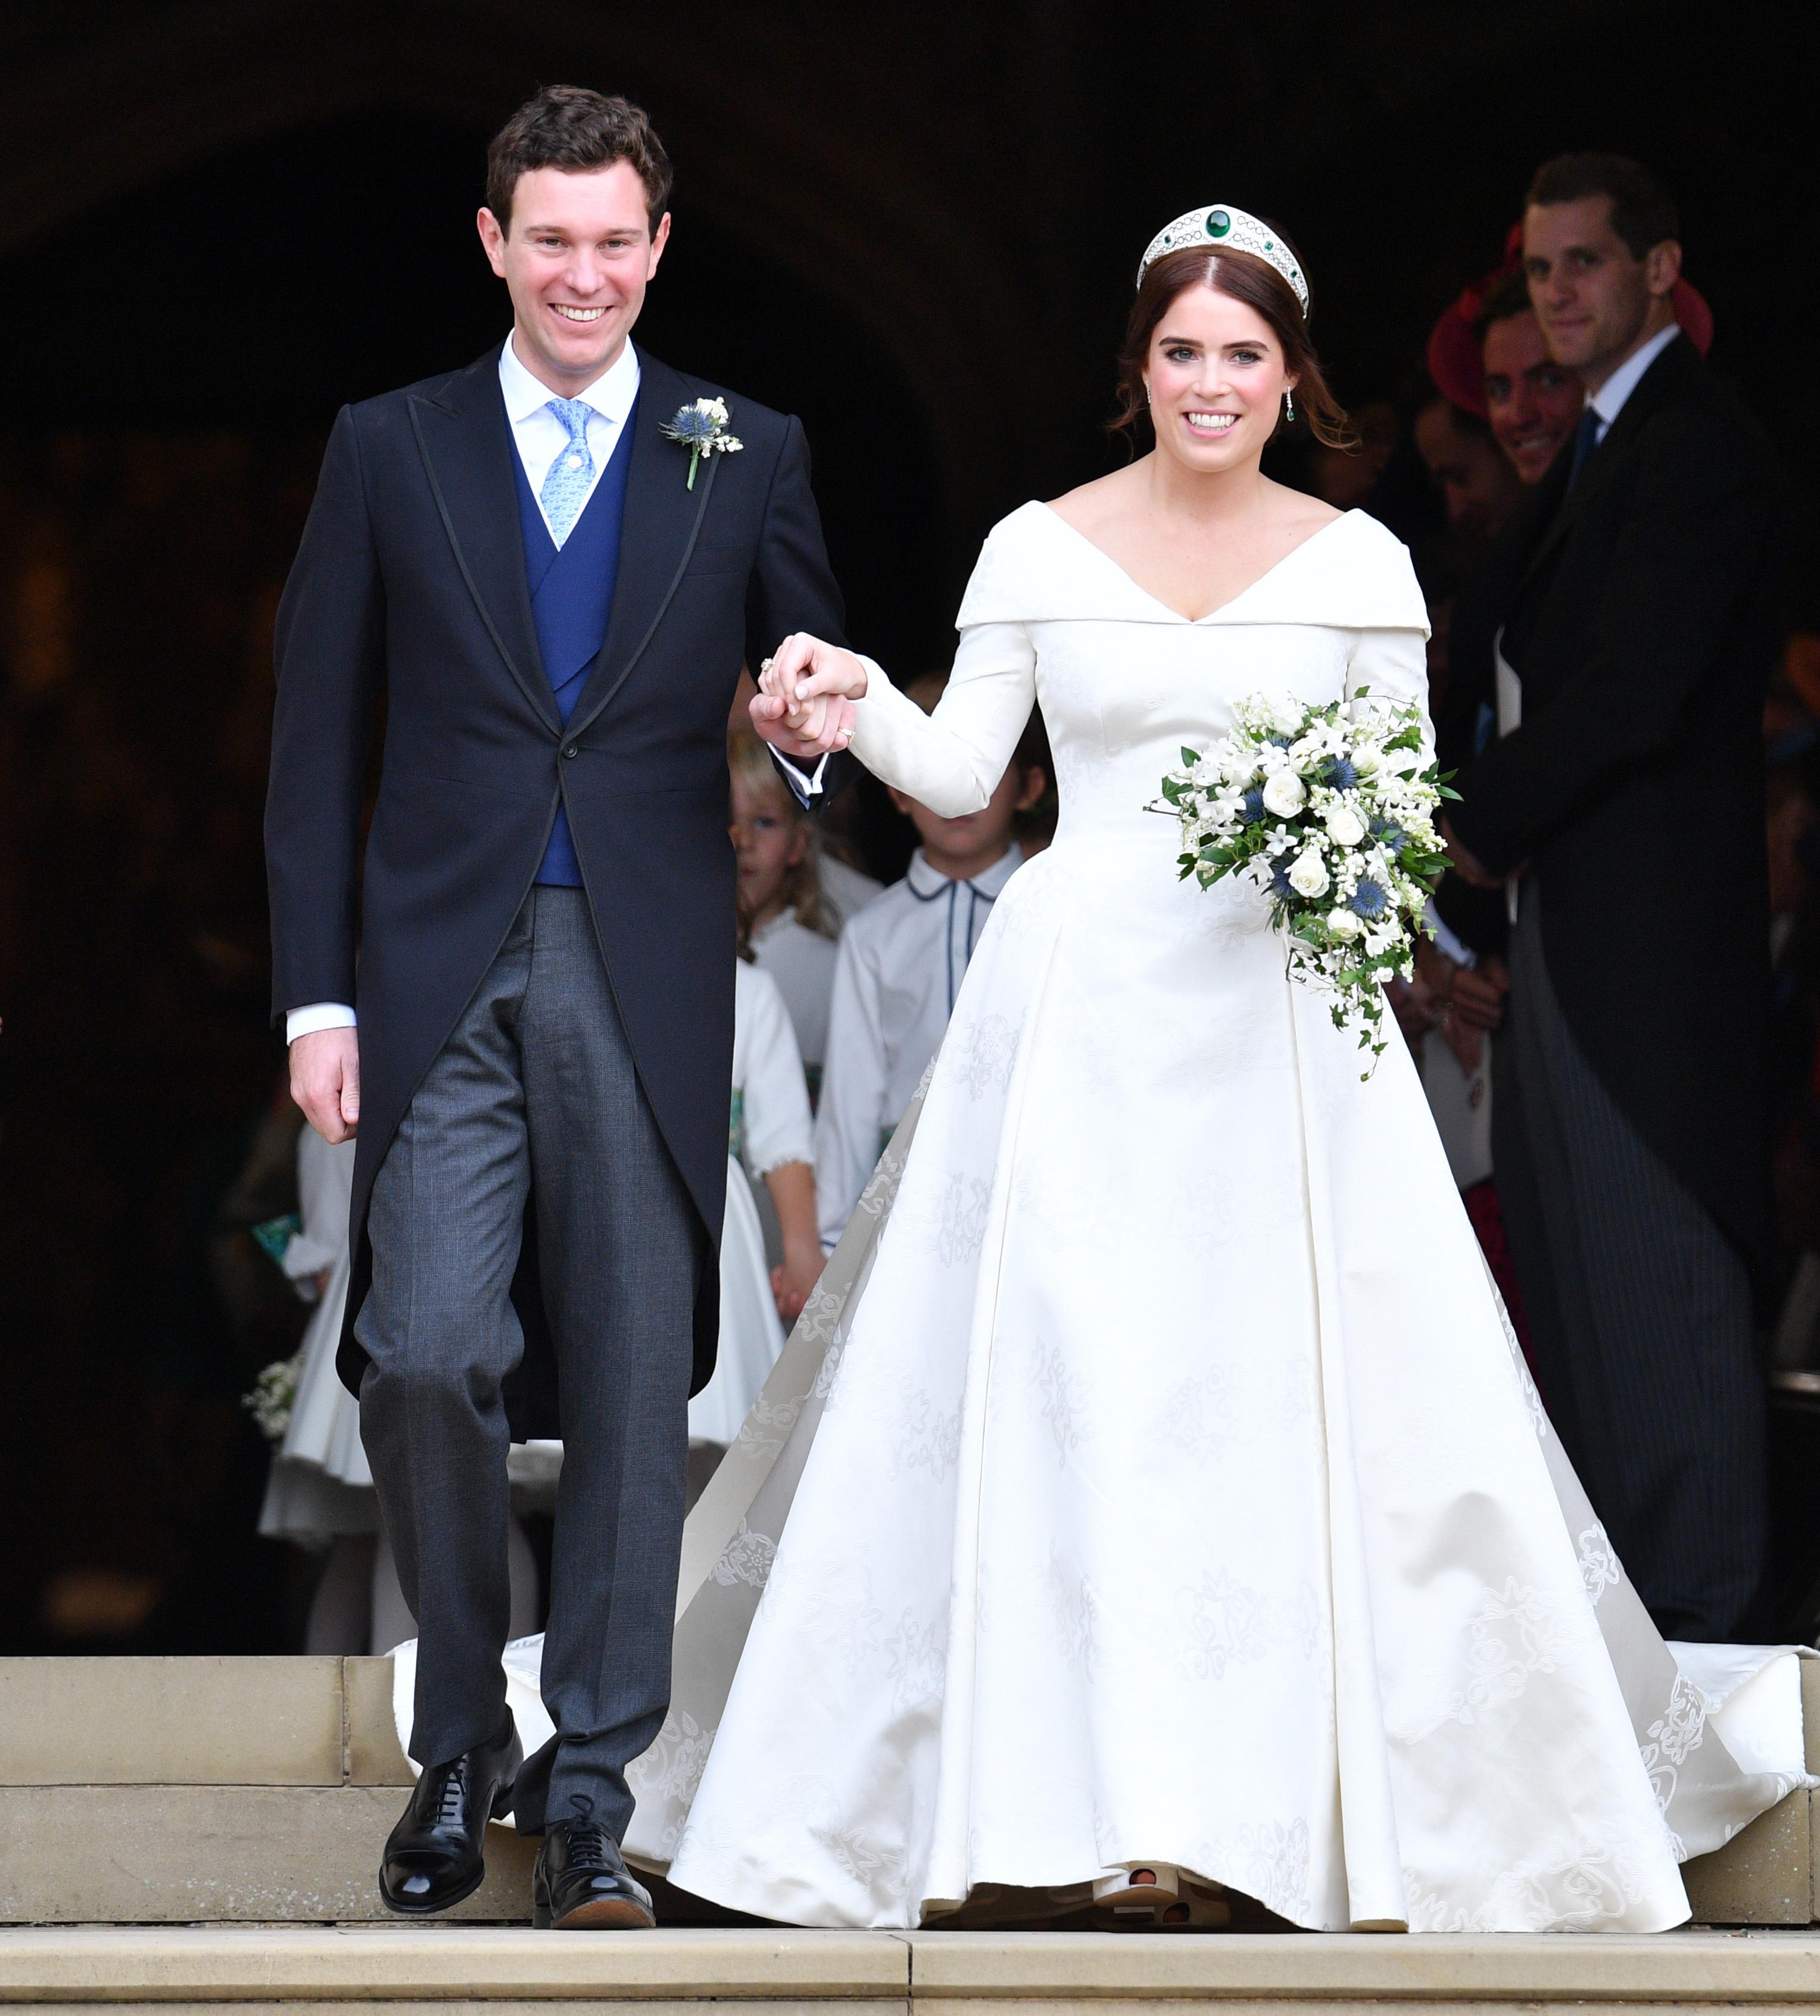 Celebrity Wedding Dresses 2019: Sarah Ferguson Reacts To Speculation That Princess Eugenie